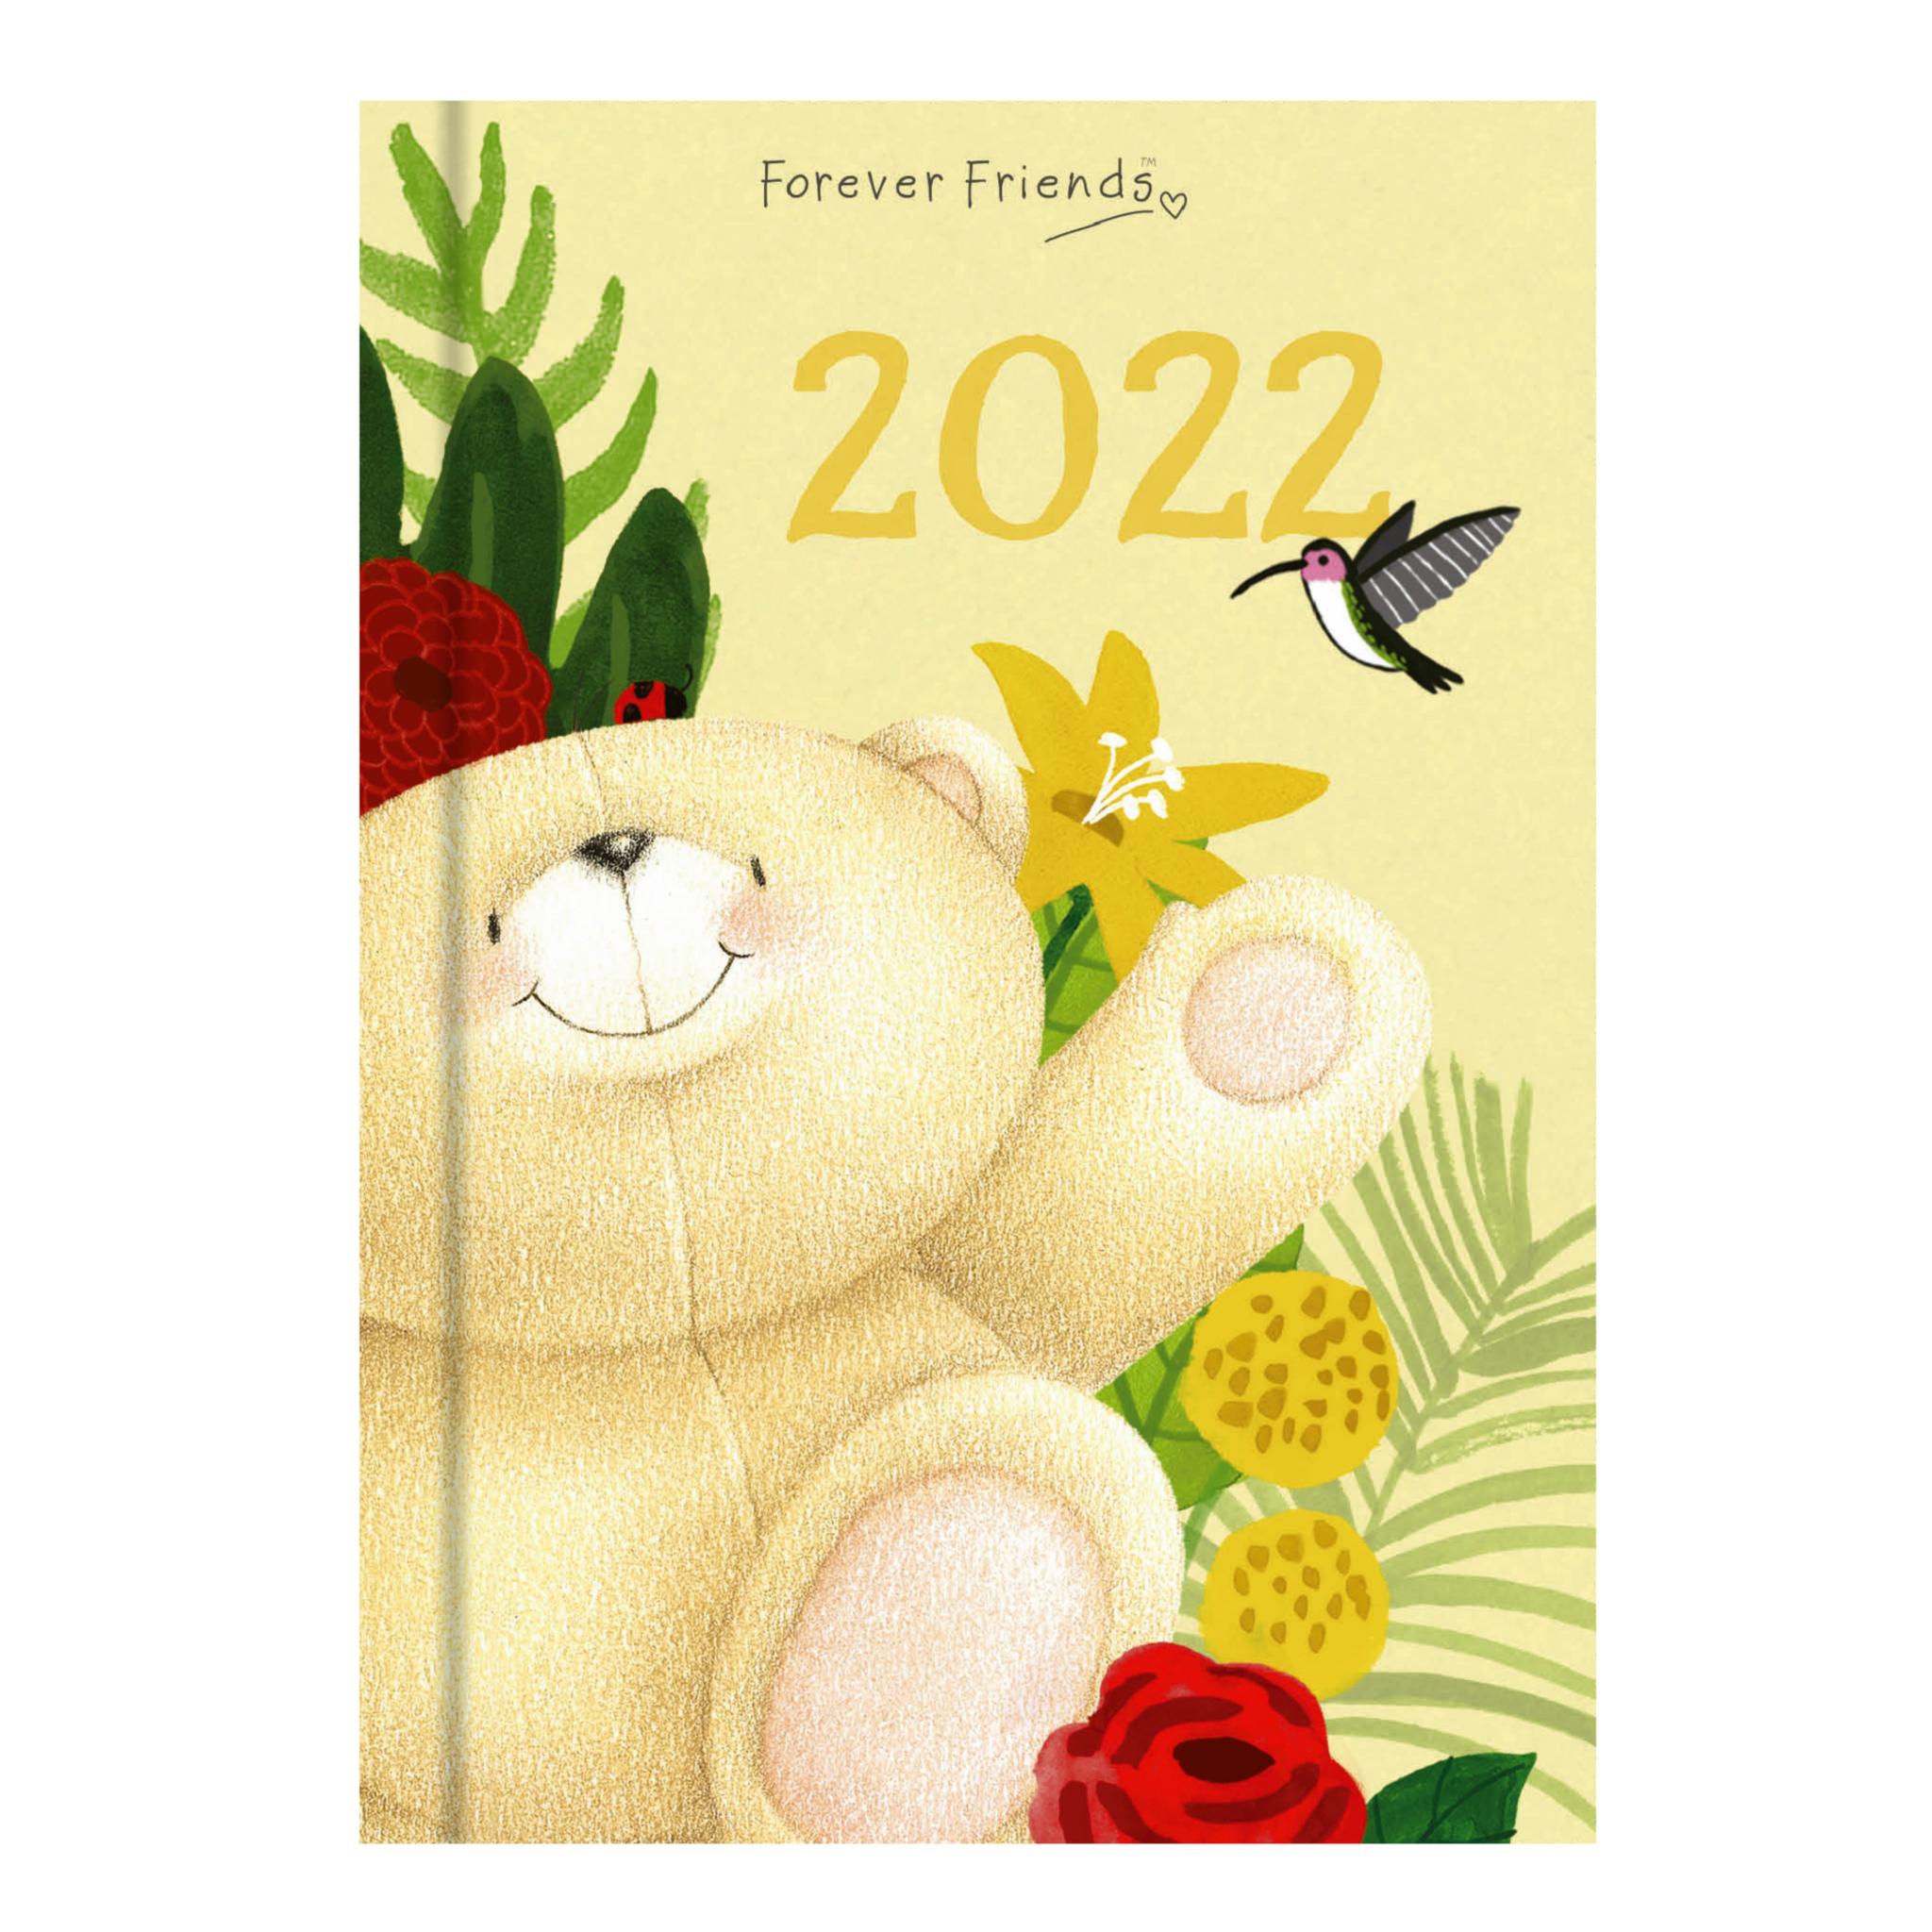 Hallmark Agenda - 2022 - Forever friends